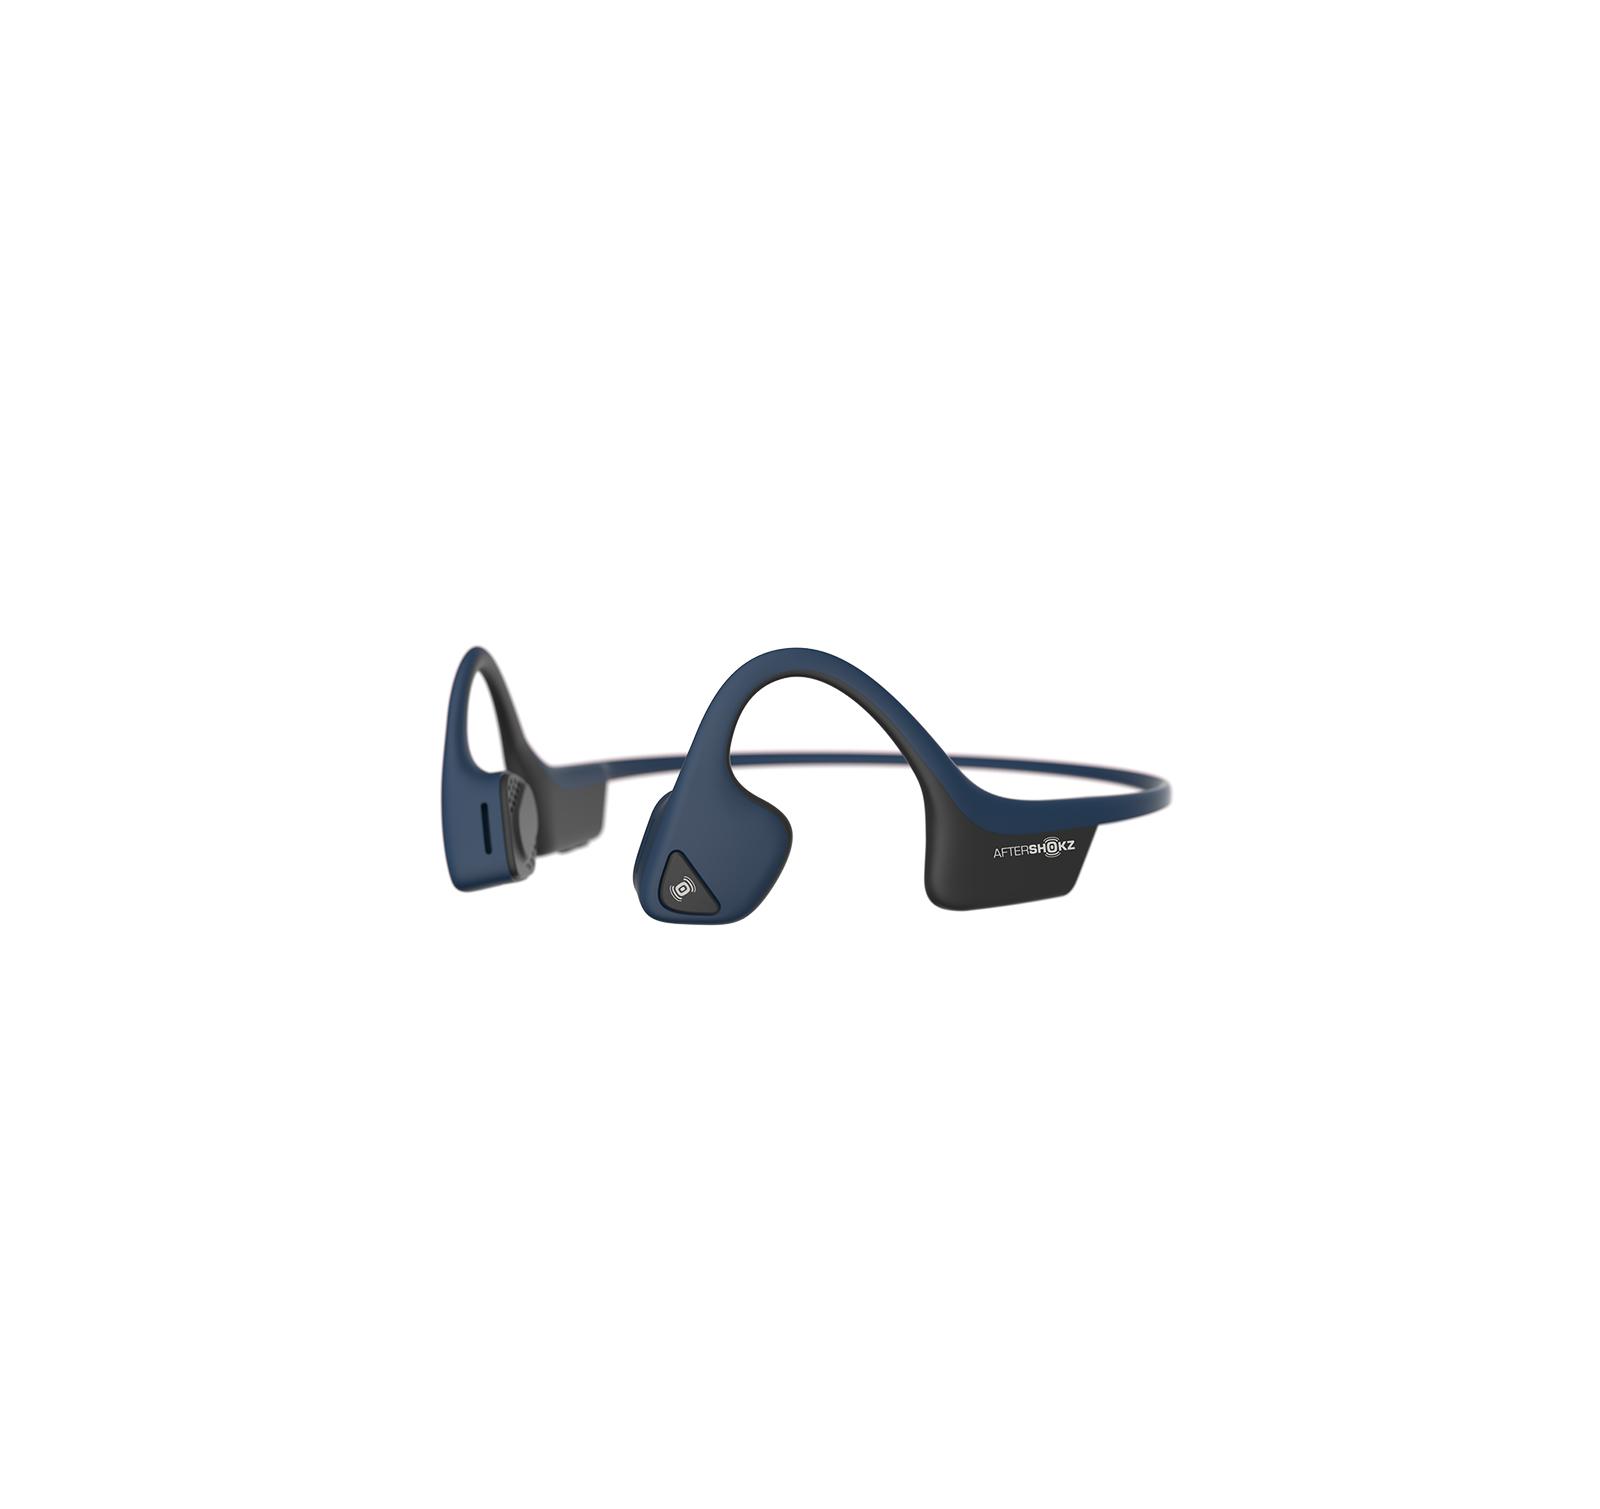 AfterShokz-Trekz-Air-Wireless-Bone-Conduction-Headphones thumbnail 5